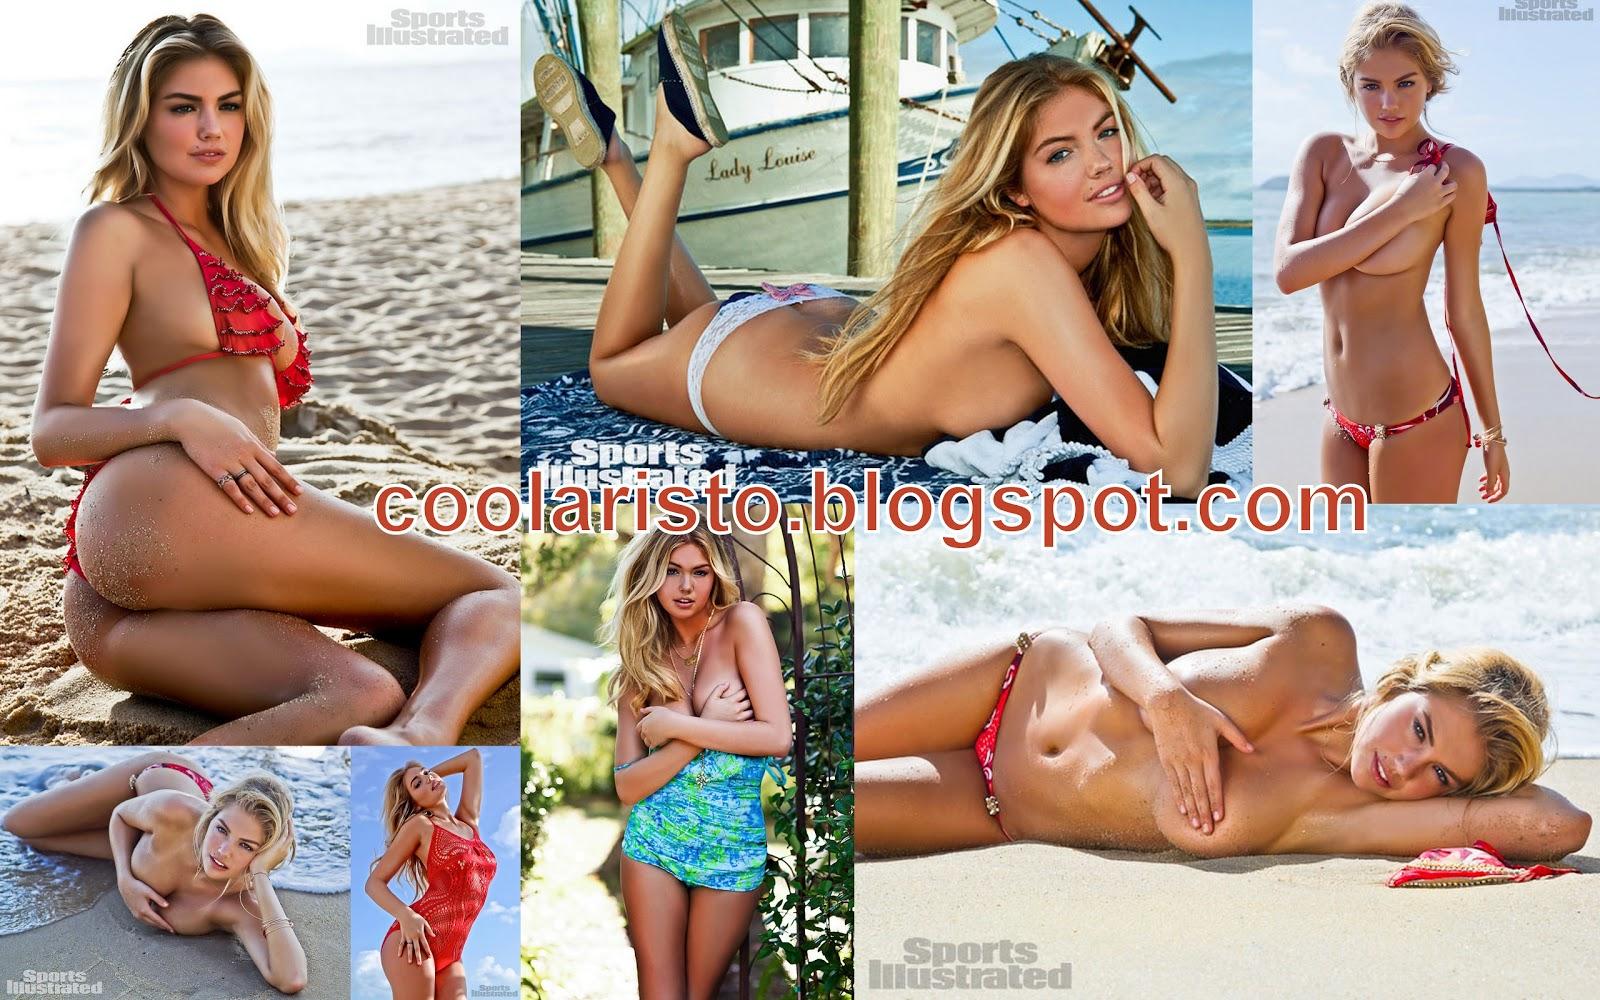 http://2.bp.blogspot.com/-G0HsG_dGOYA/Tzrs133uioI/AAAAAAAALsI/M7Sij45XuMU/s1600/kate+upton+illustrated+2012+coolaristo+cover.jpg